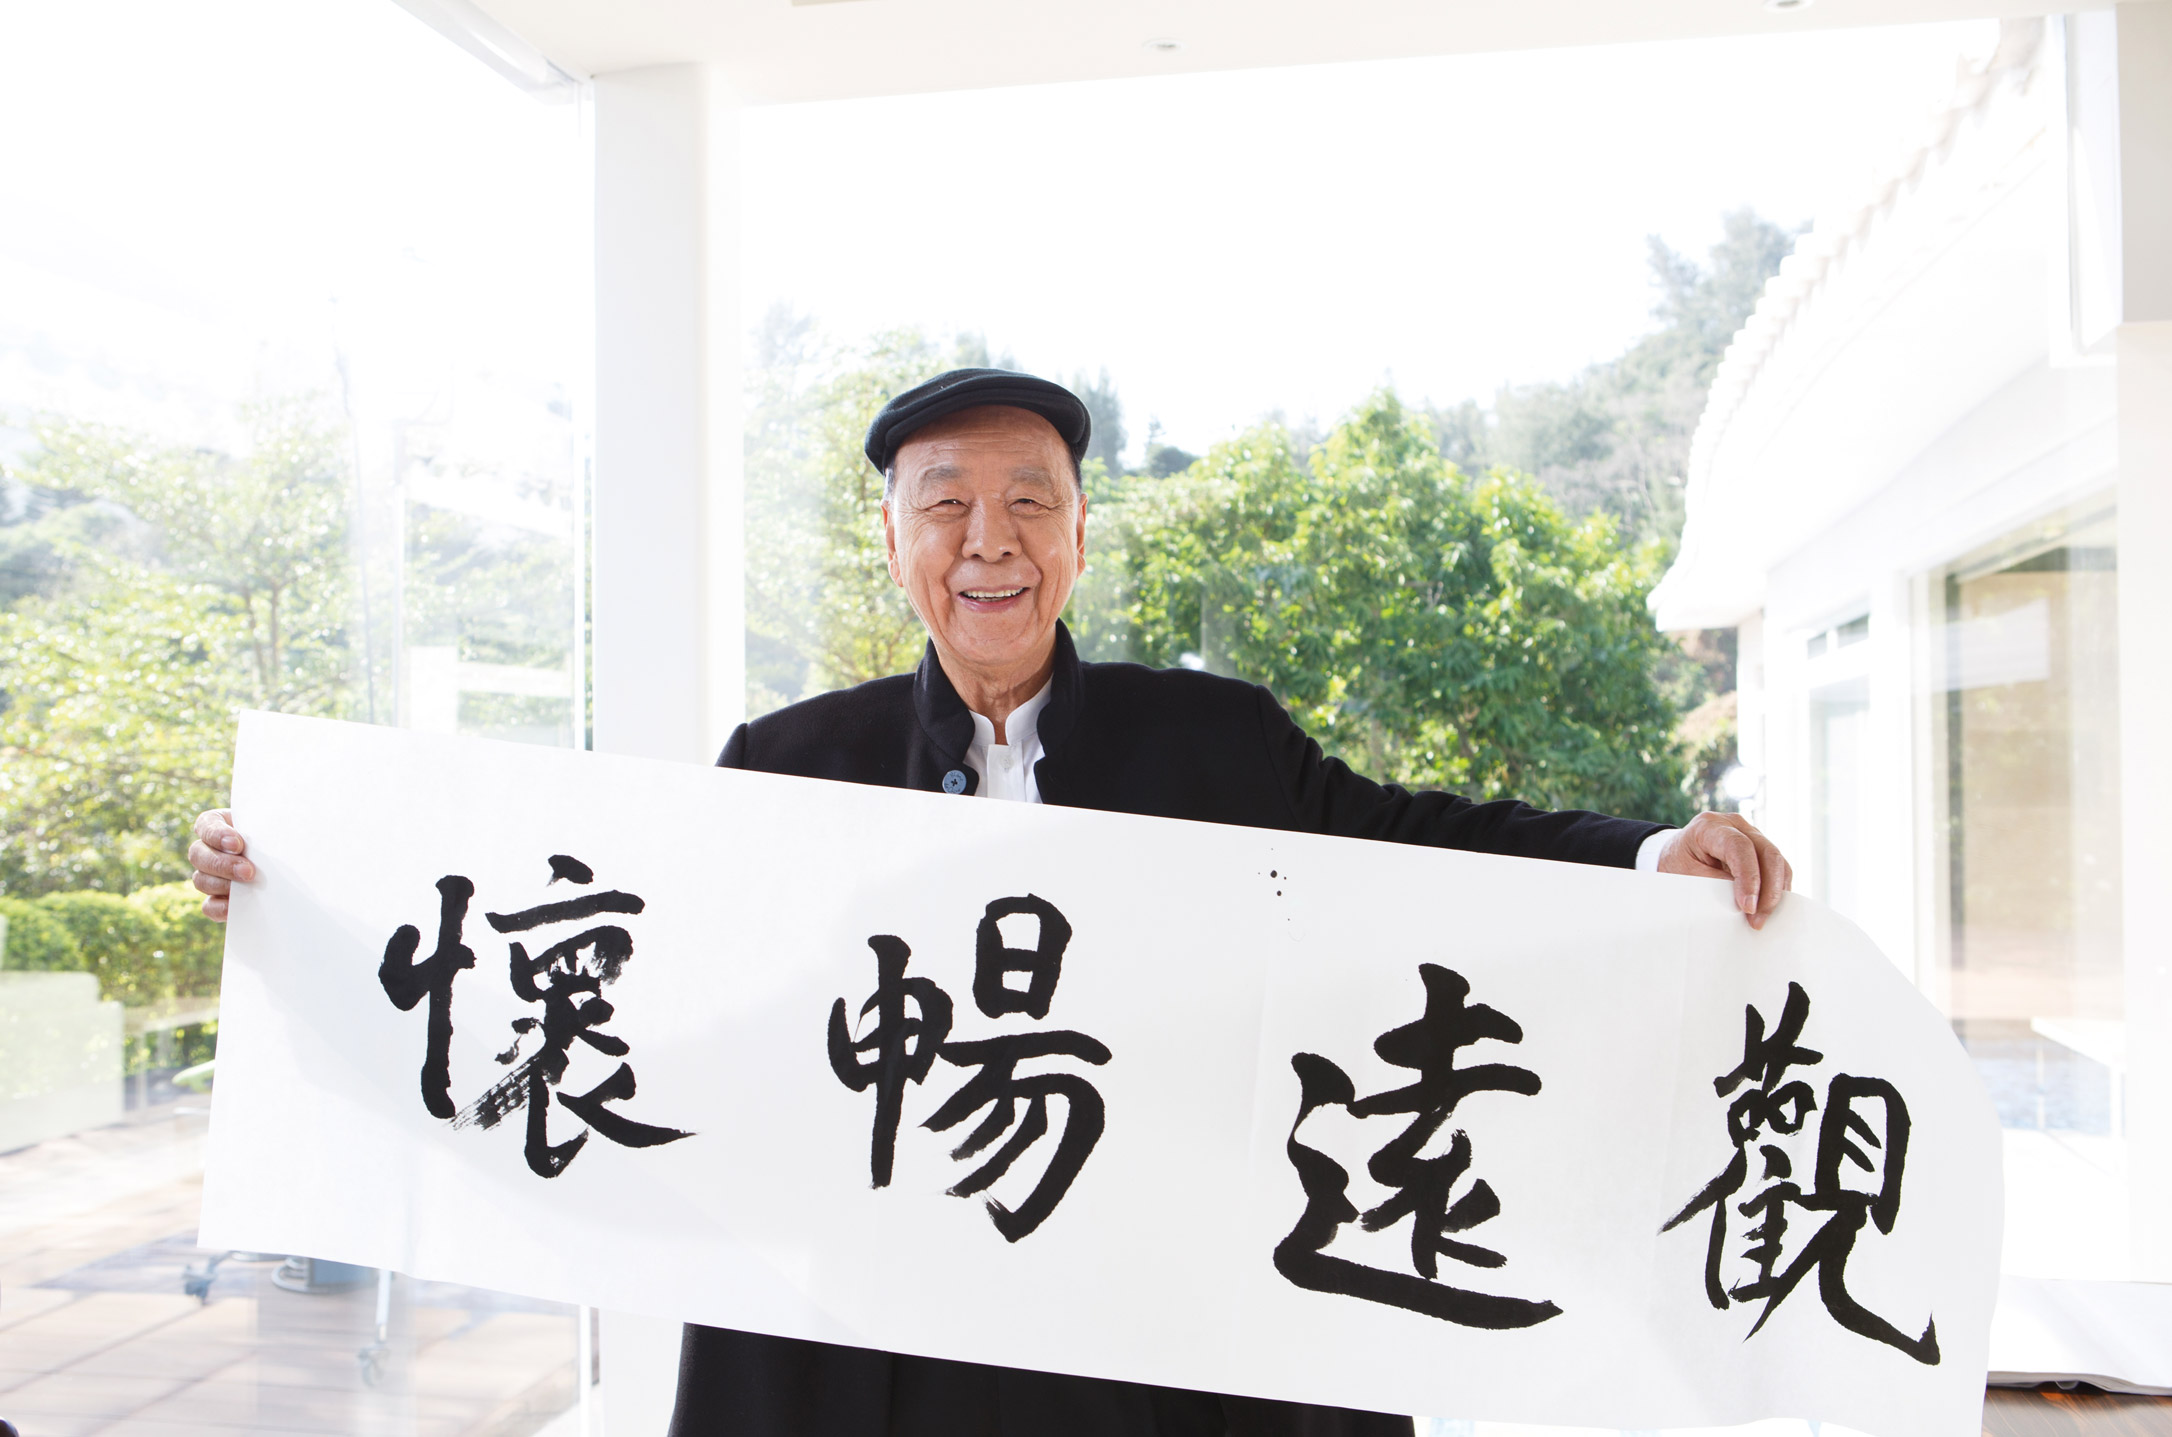 Dr. Lui Che-woo